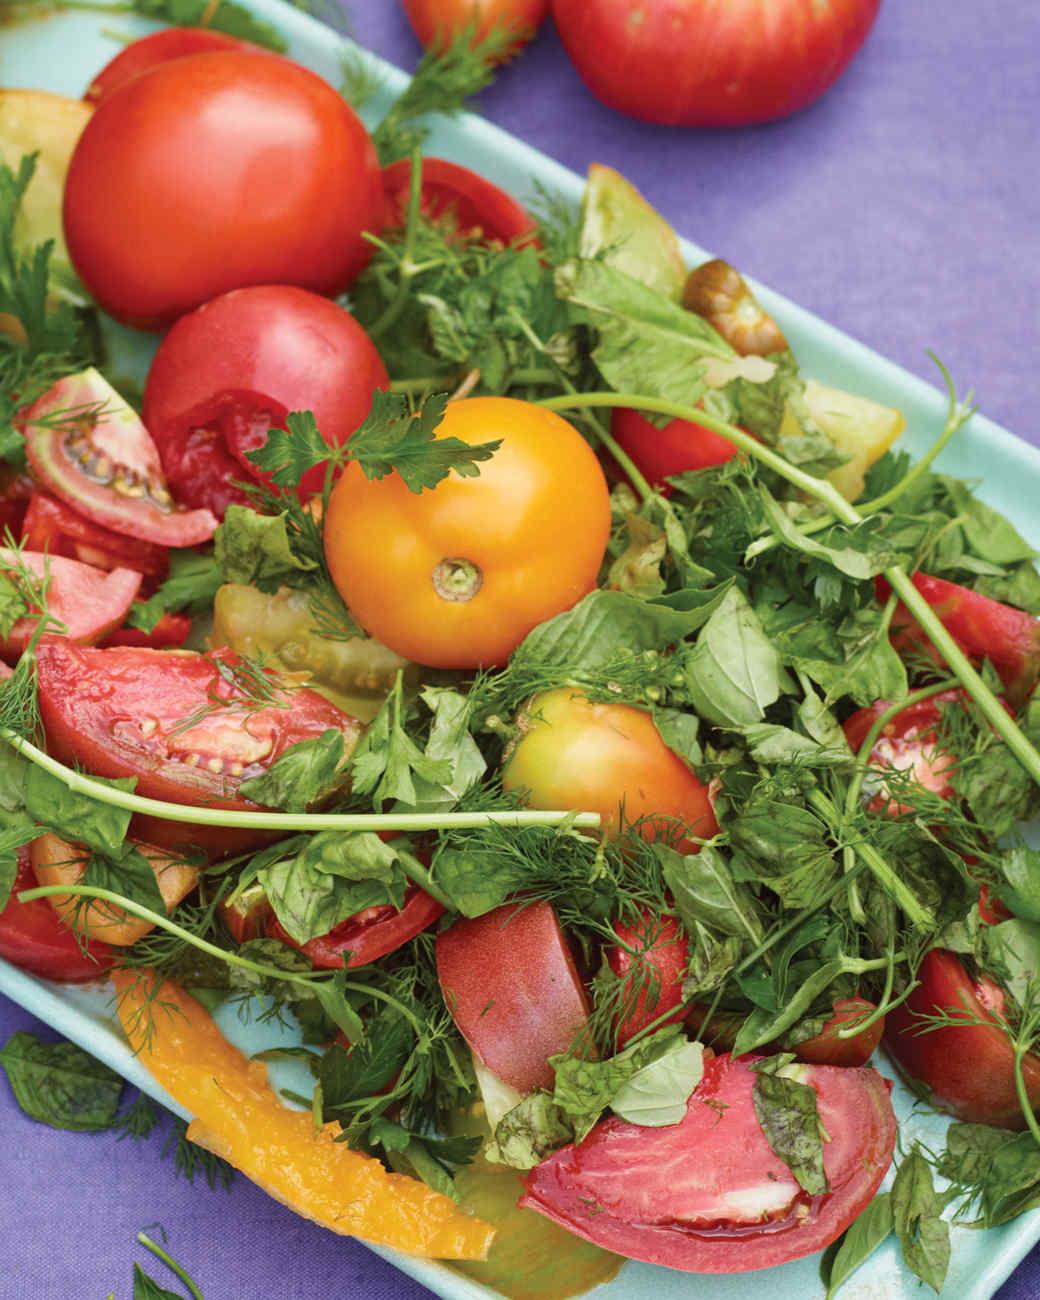 mld106444_0311_tomato_salad_detail.jpg